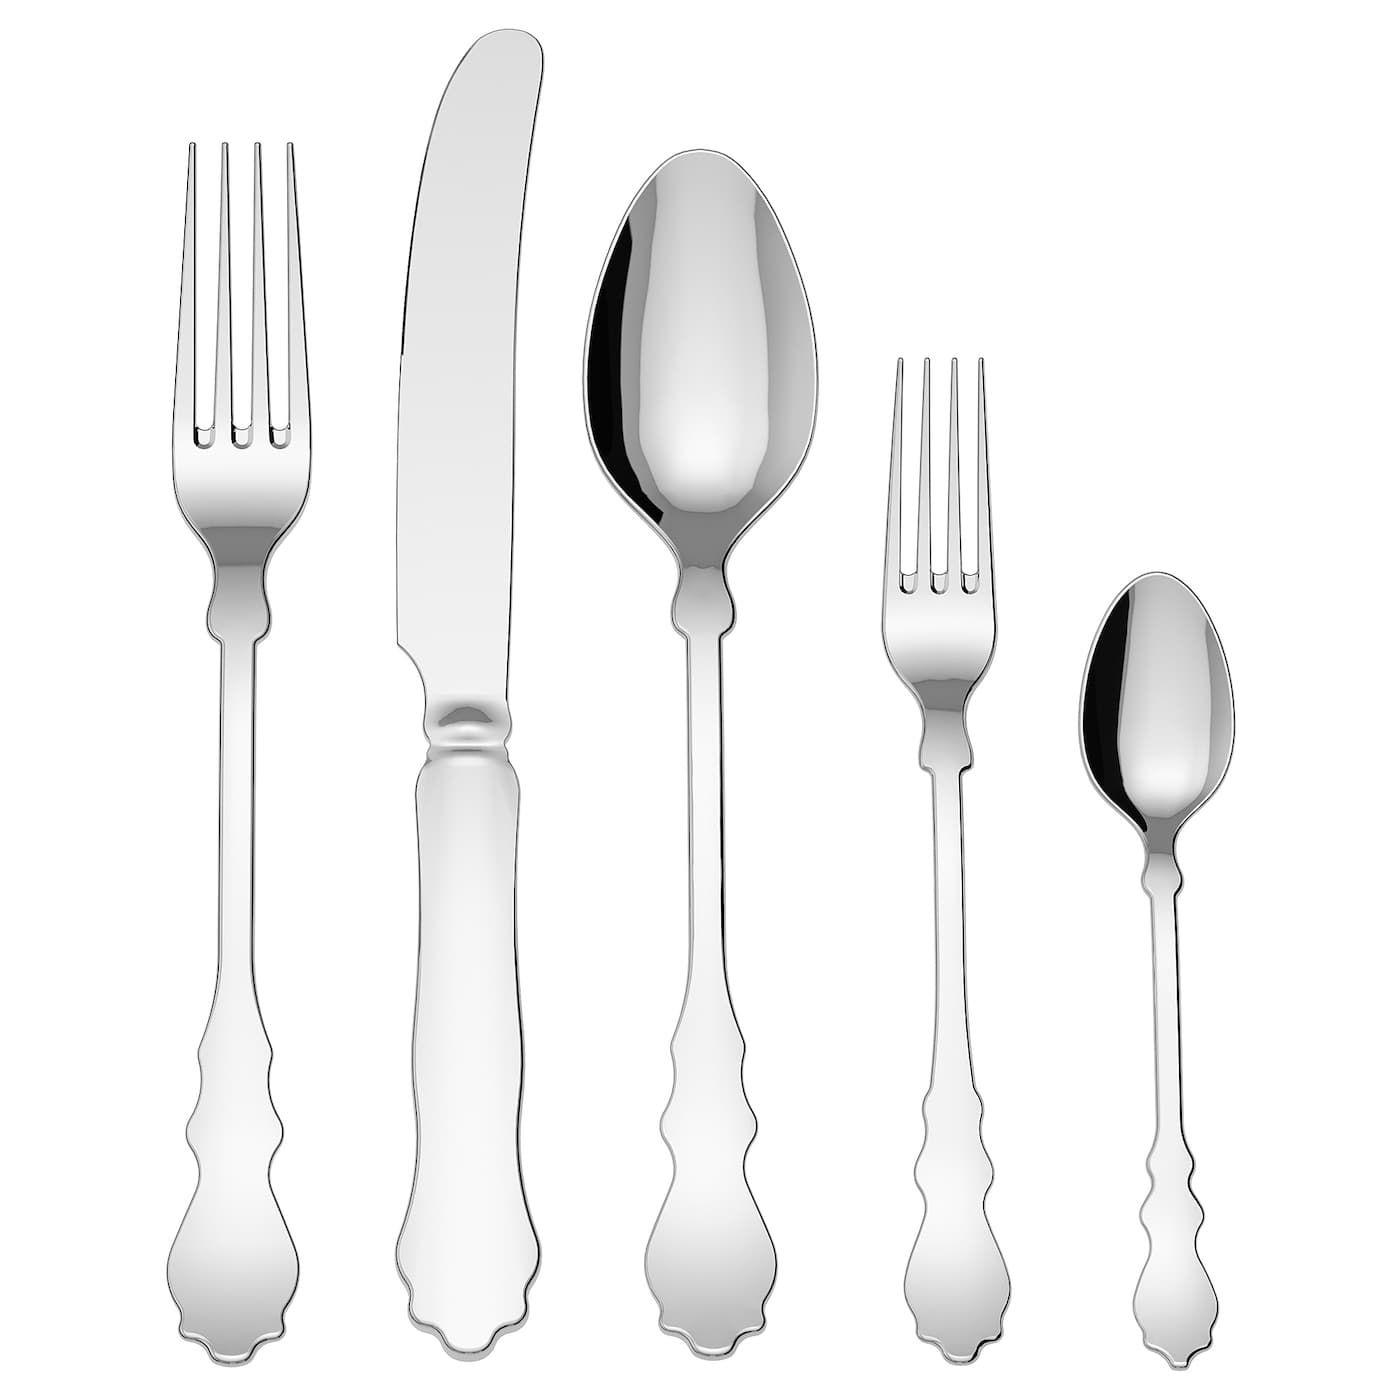 Flatware Knives Cutlery Bruntmor 20 Piece Silverware Stainless Steel Flatware Cutlery Set Service For 4 Home Garden Gefradis Fr